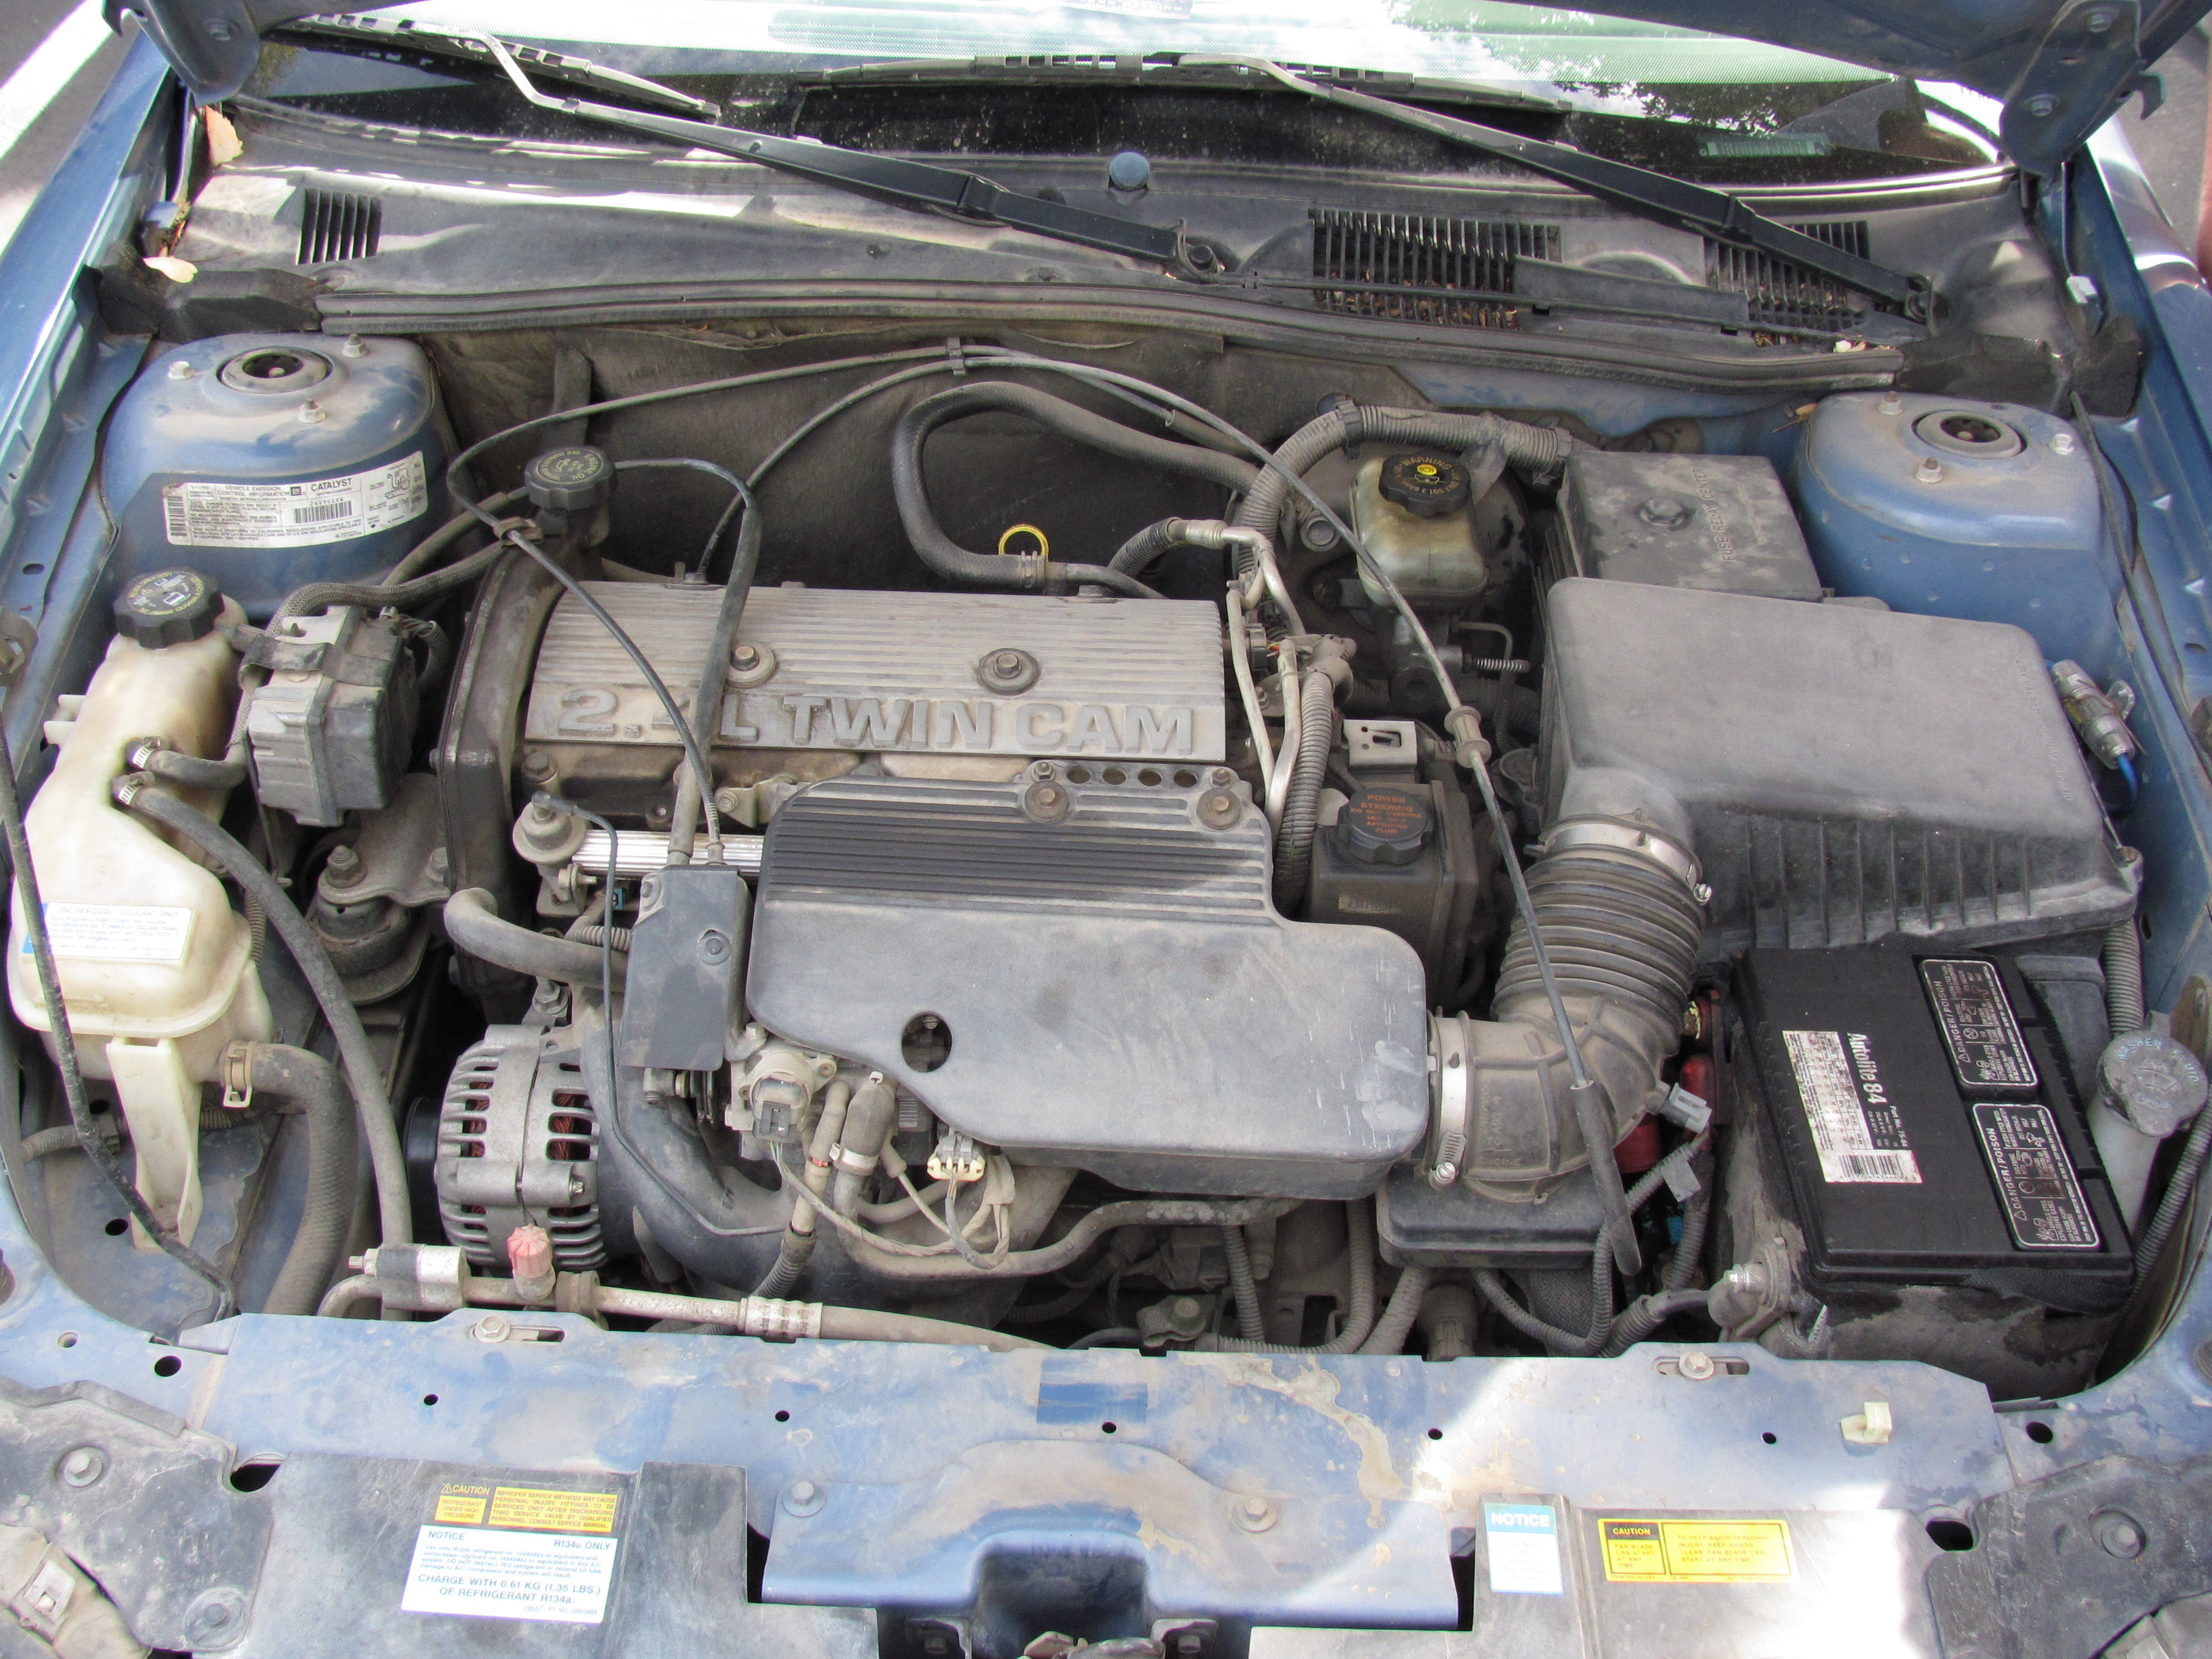 1997 Chevrolet Malibu Information And Photos Zomb Drive